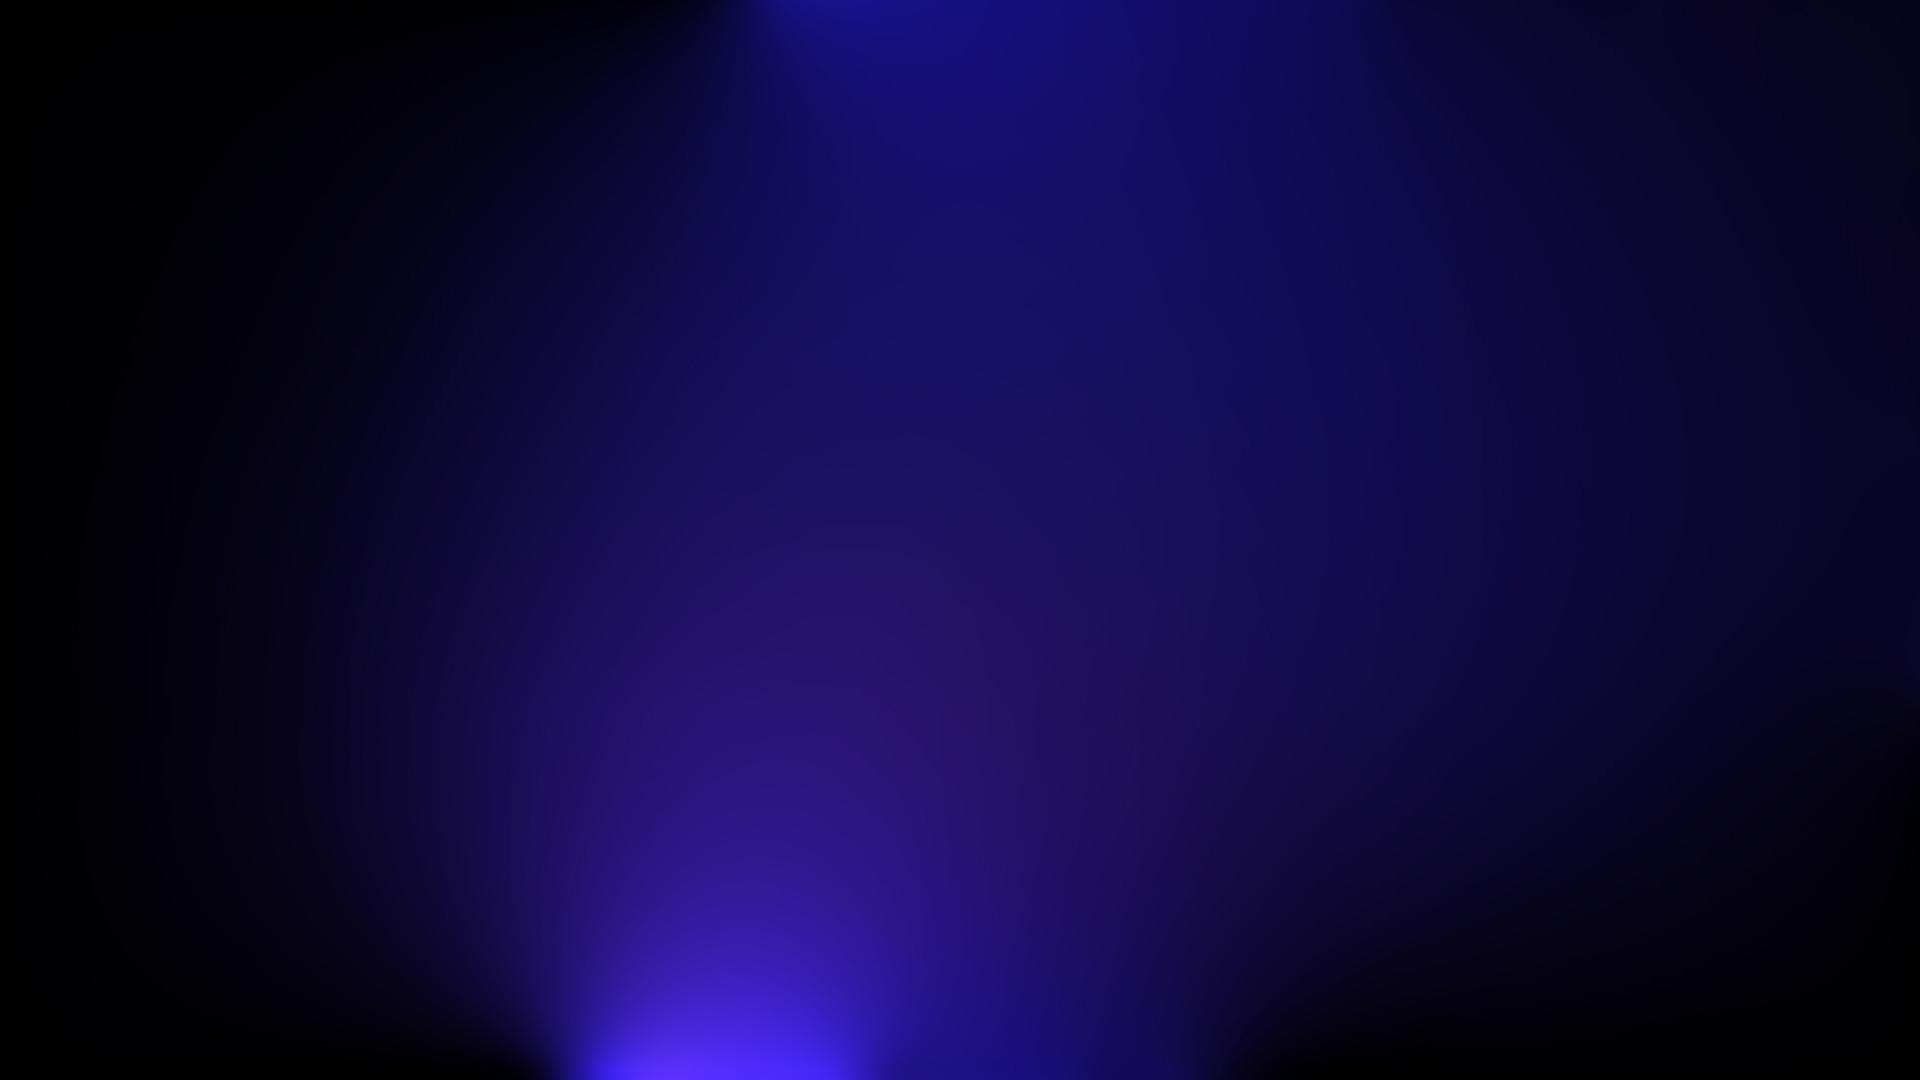 1920x1080 Dark Meets Blue desktop PC and Mac wallpaper 1920x1080